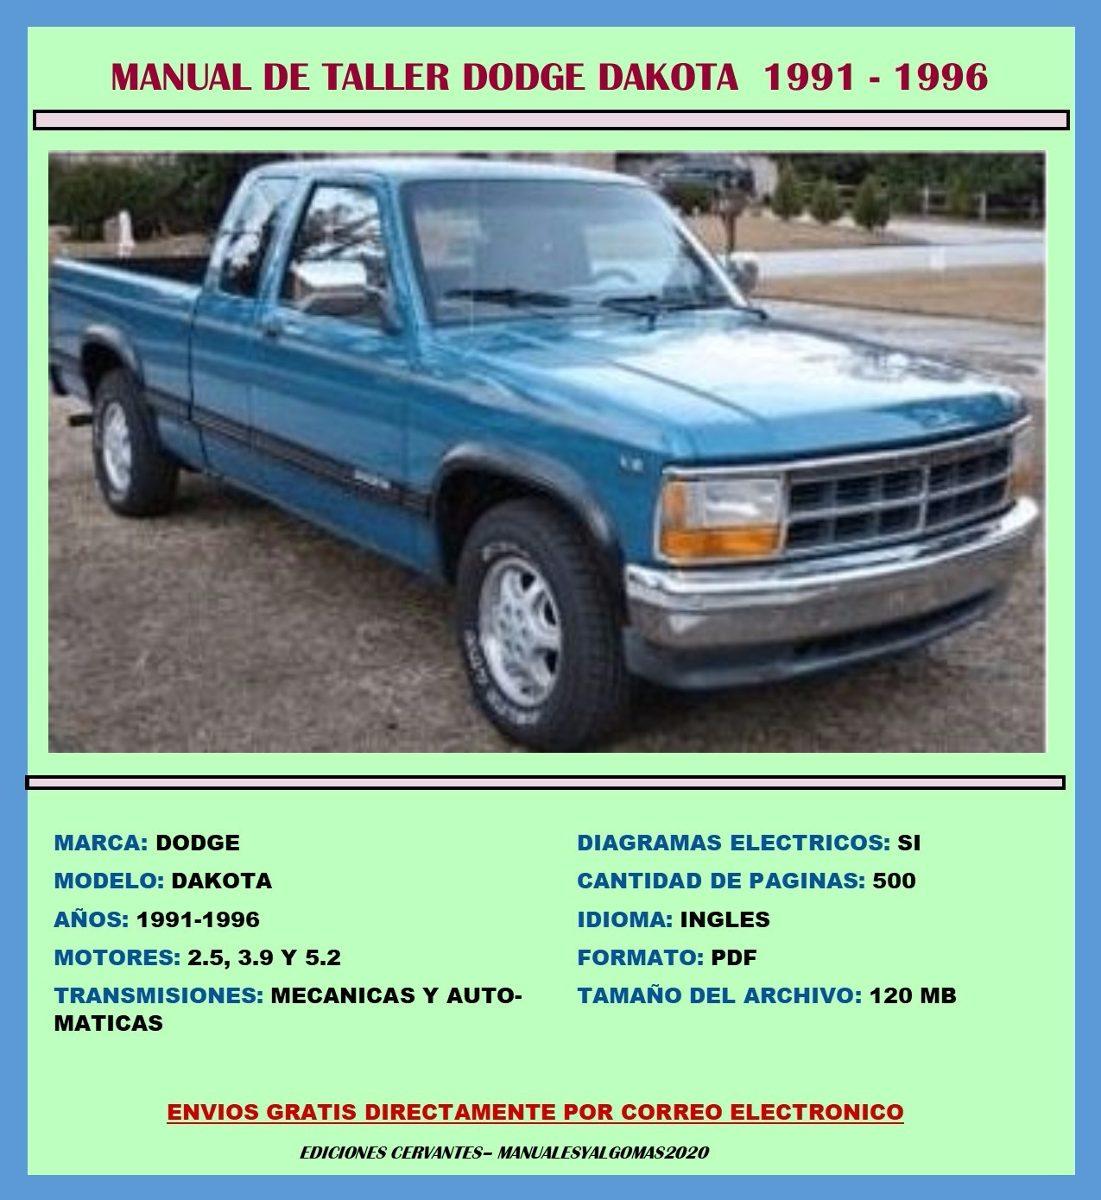 manual de taller despiece servicio diagramas dakota 1991 96 bs rh articulo mercadolibre com ve 1991 dodge dakota owners manual 1991 dodge dakota service manual pdf